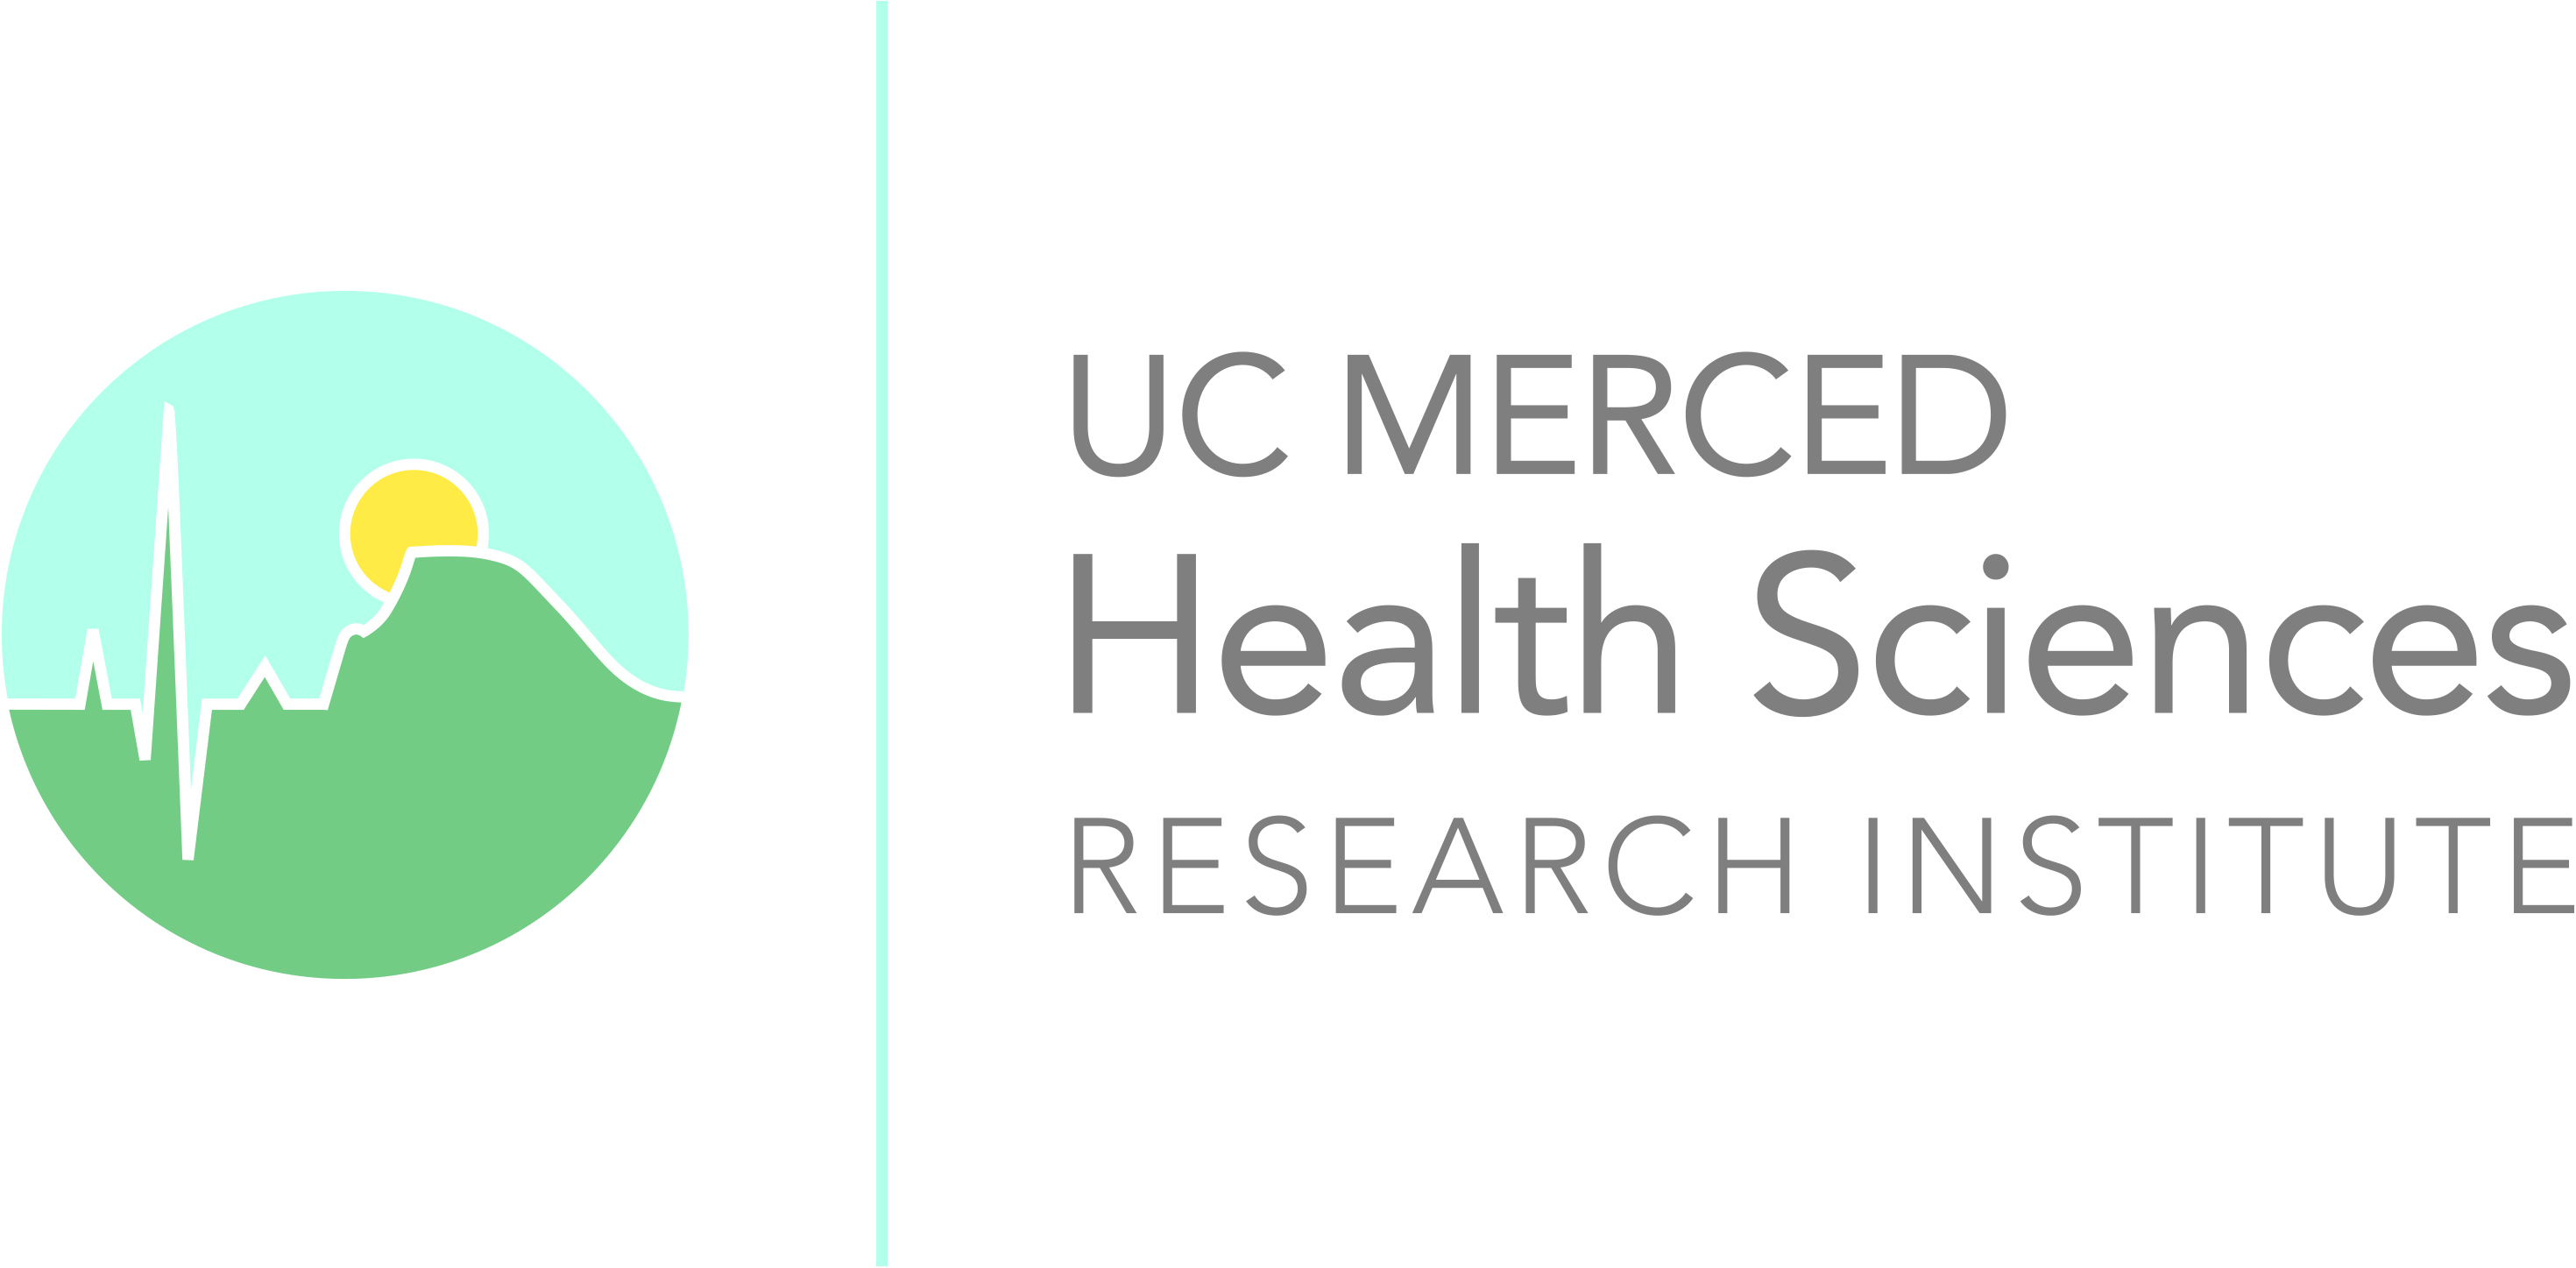 Health Sciences Research Institute